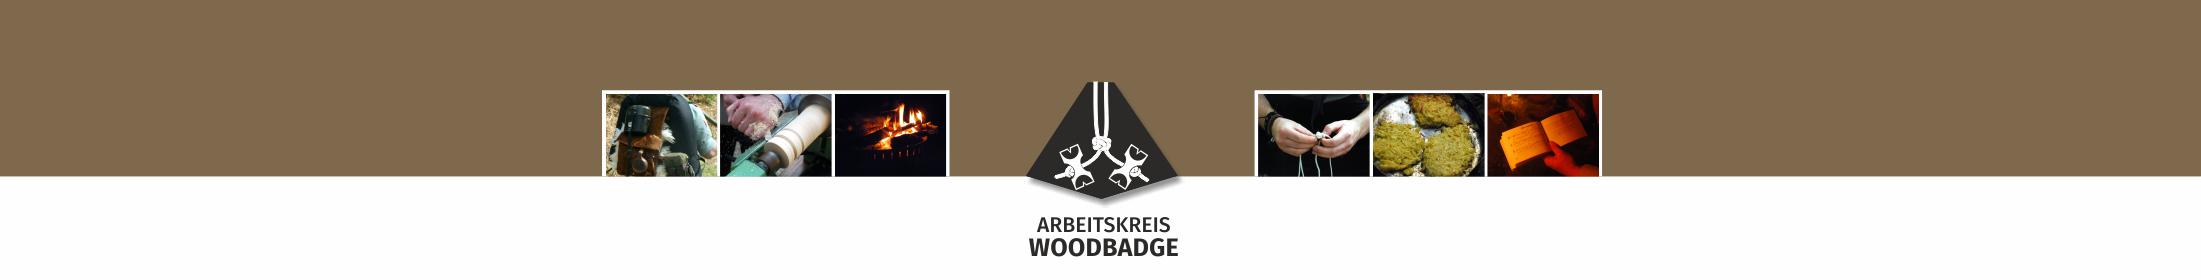 Arbeitskreis Woodbadge